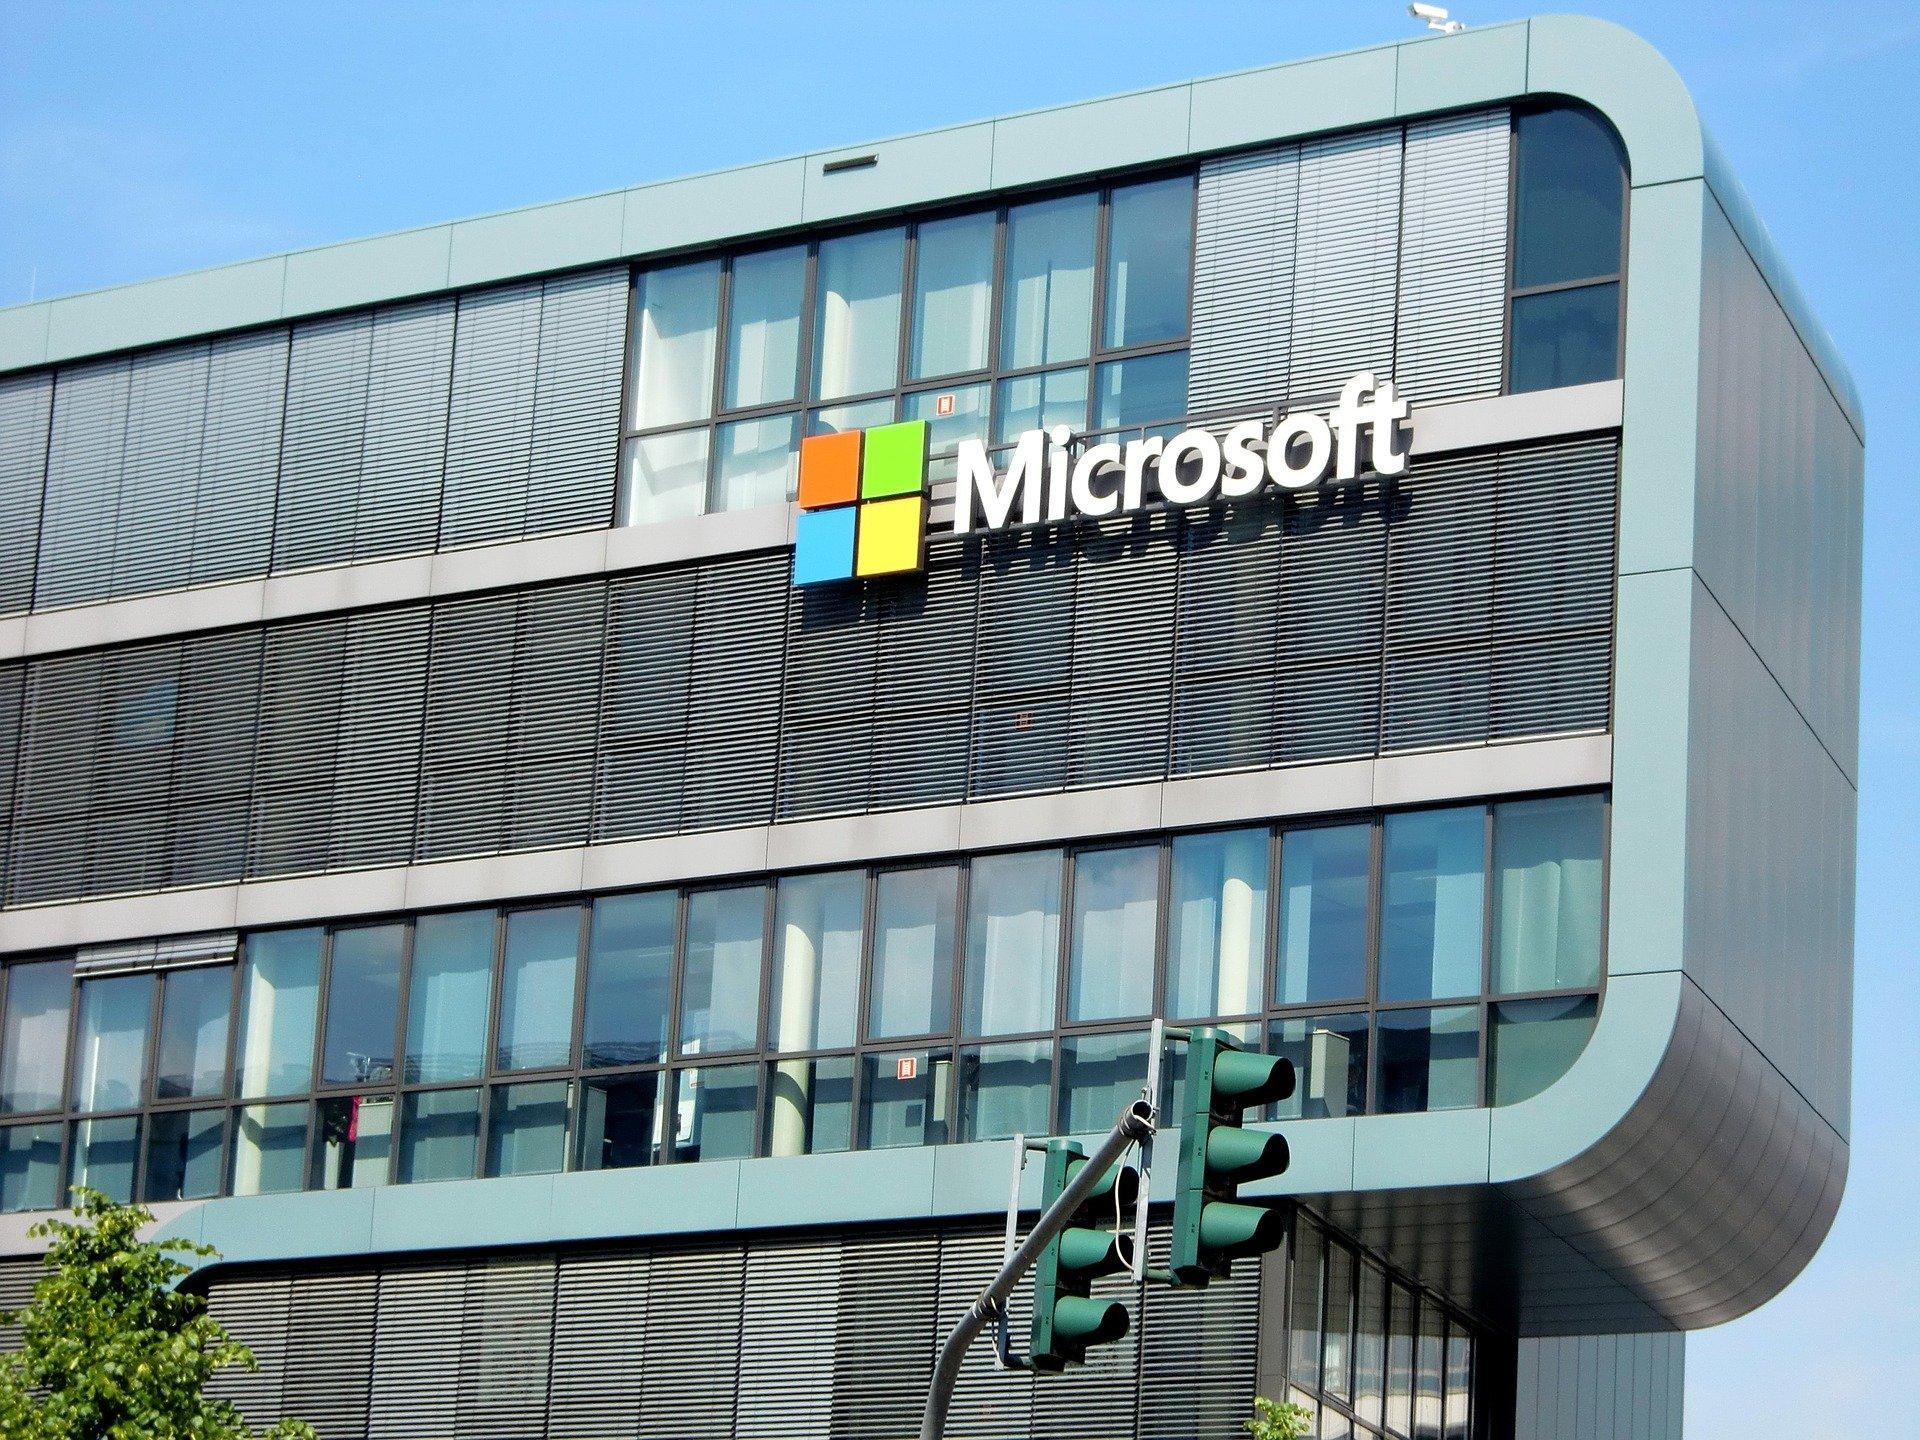 A Microsoft building.